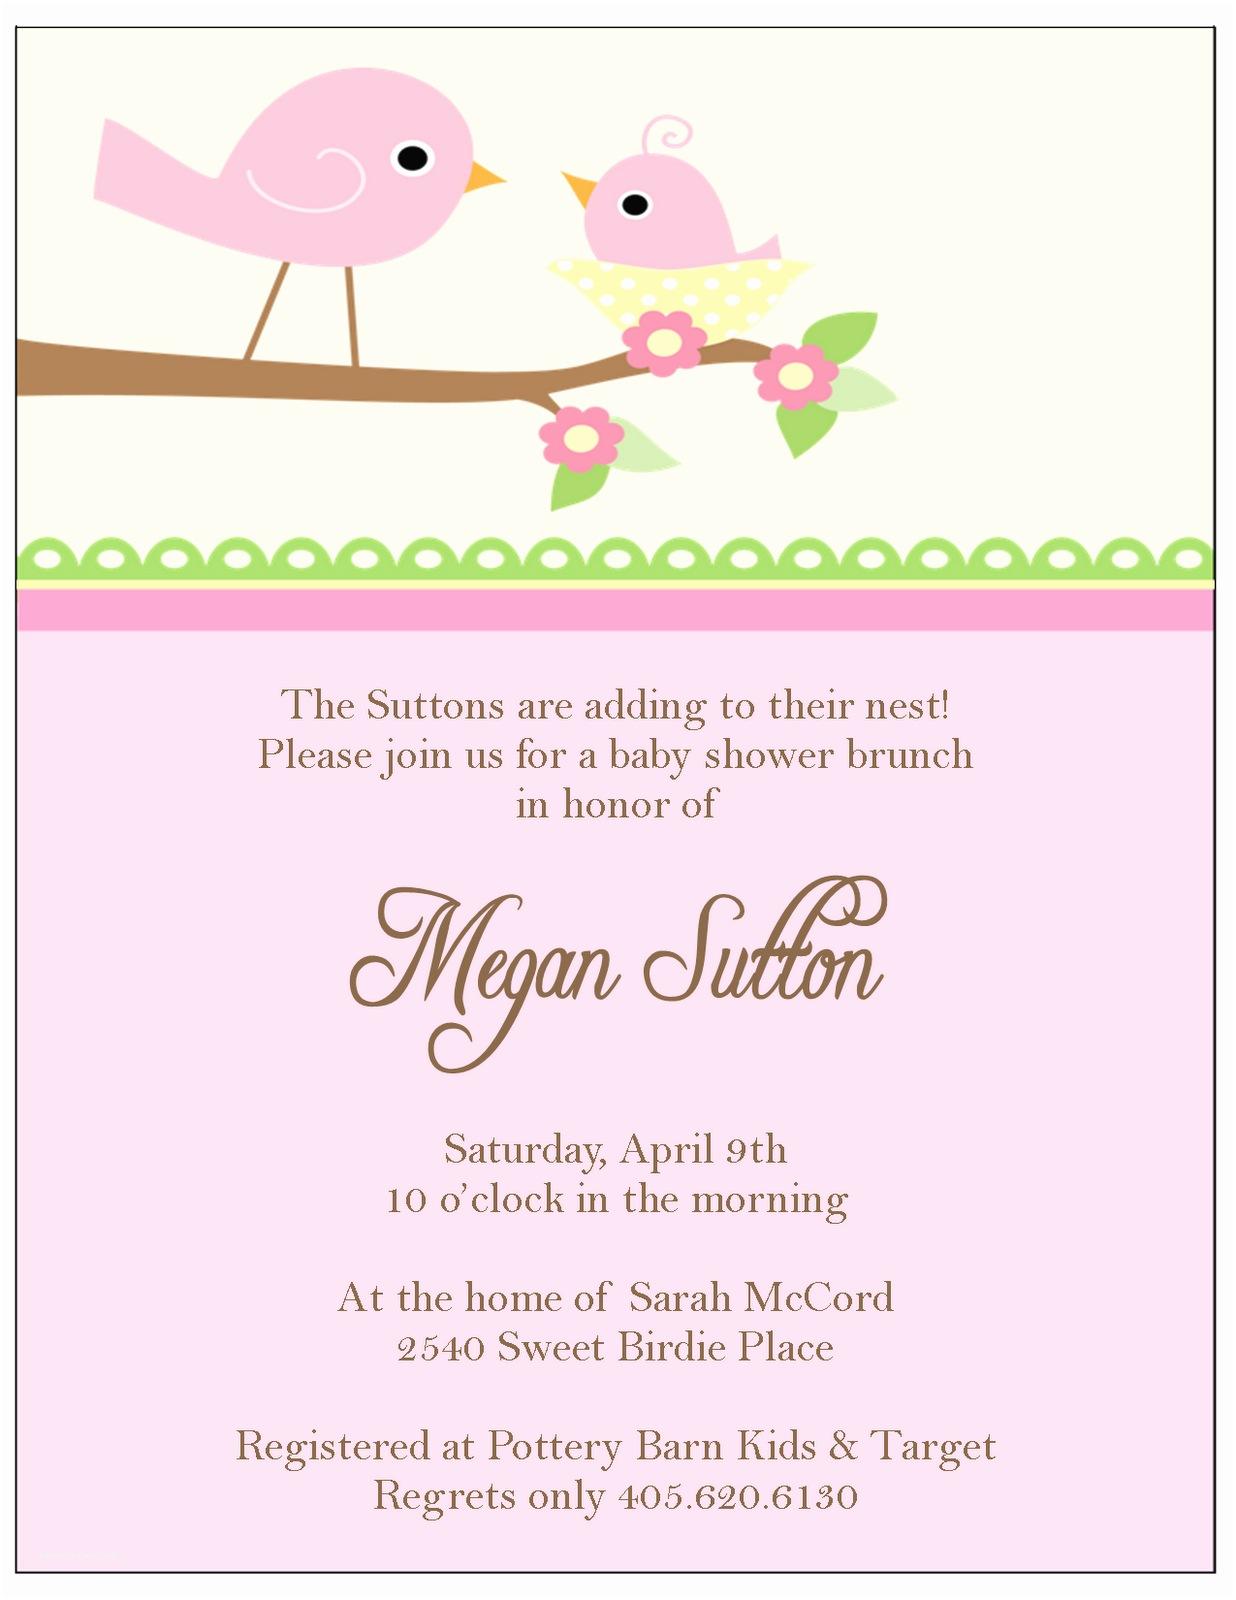 Baby Shower Invitations for Girls Baby Shower Invitations Girls